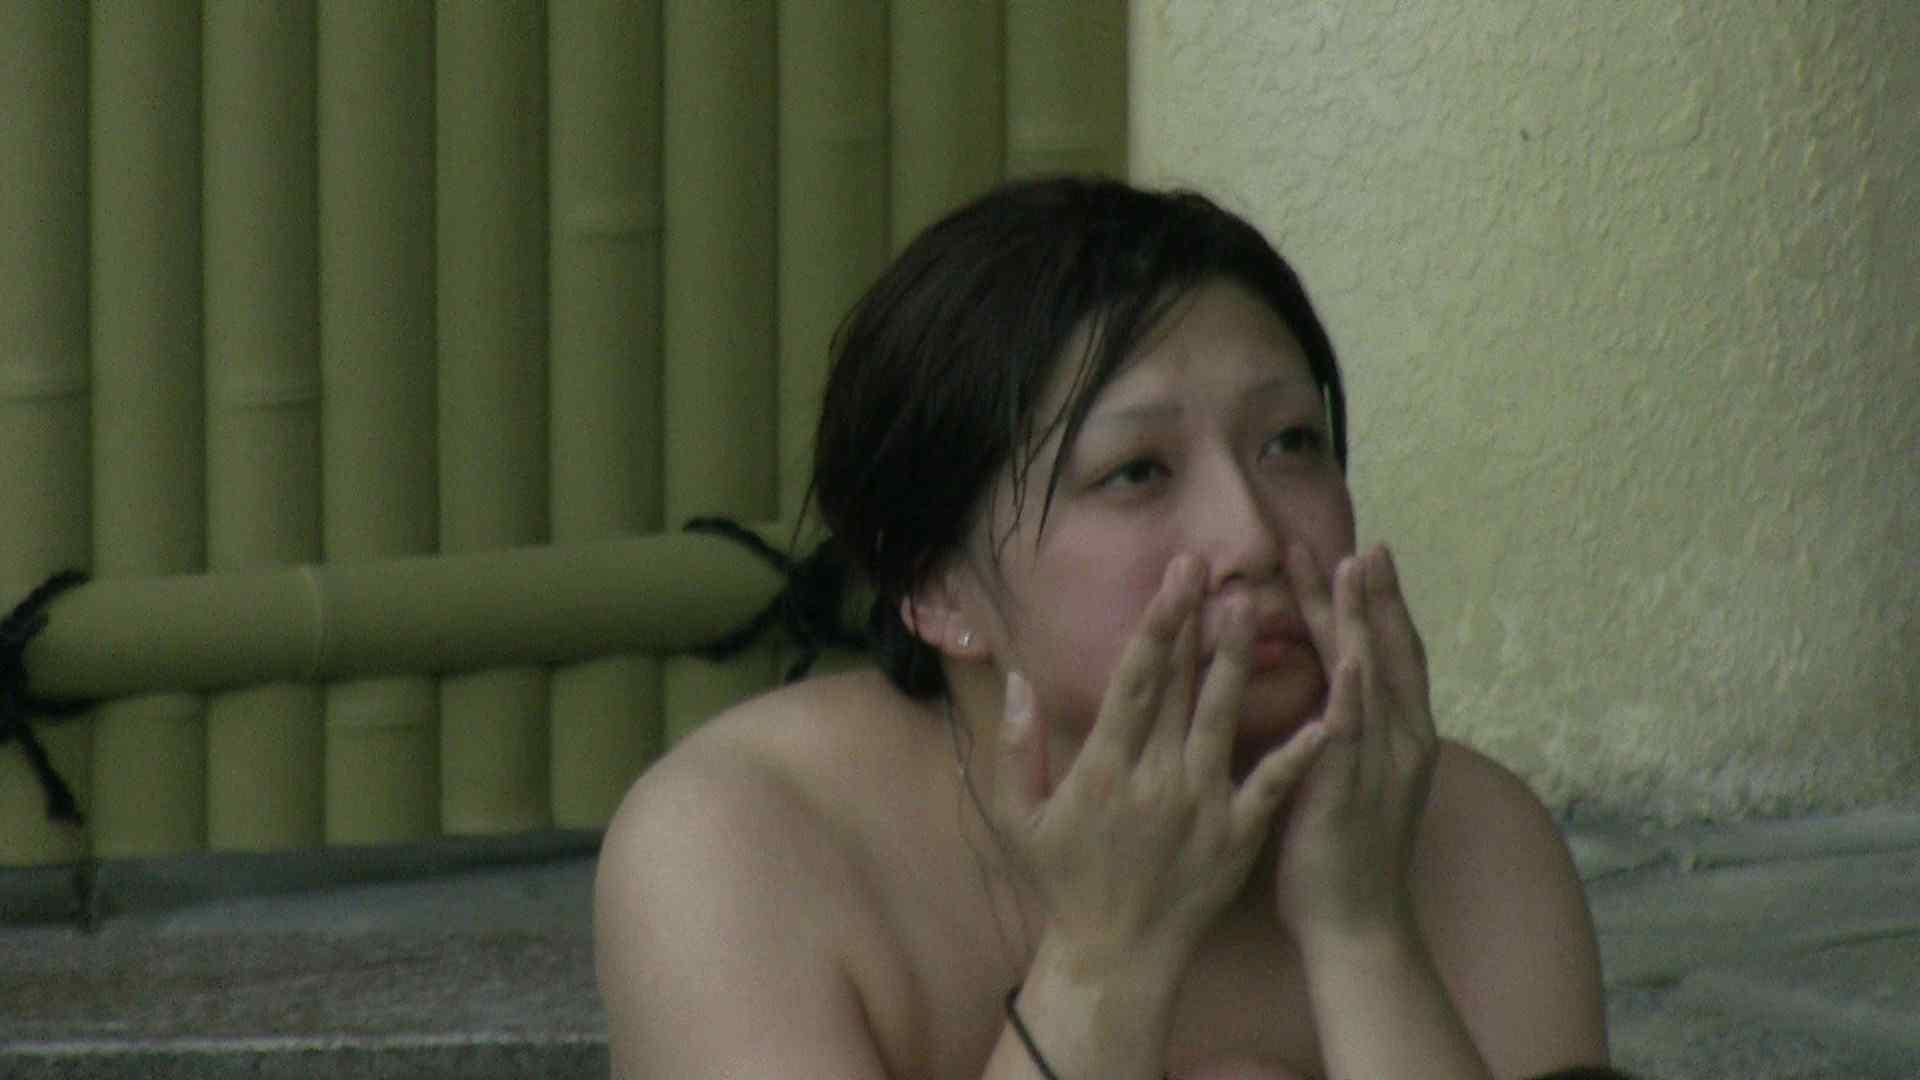 Aquaな露天風呂Vol.184 露天風呂編 | 盗撮シリーズ  87PIX 39